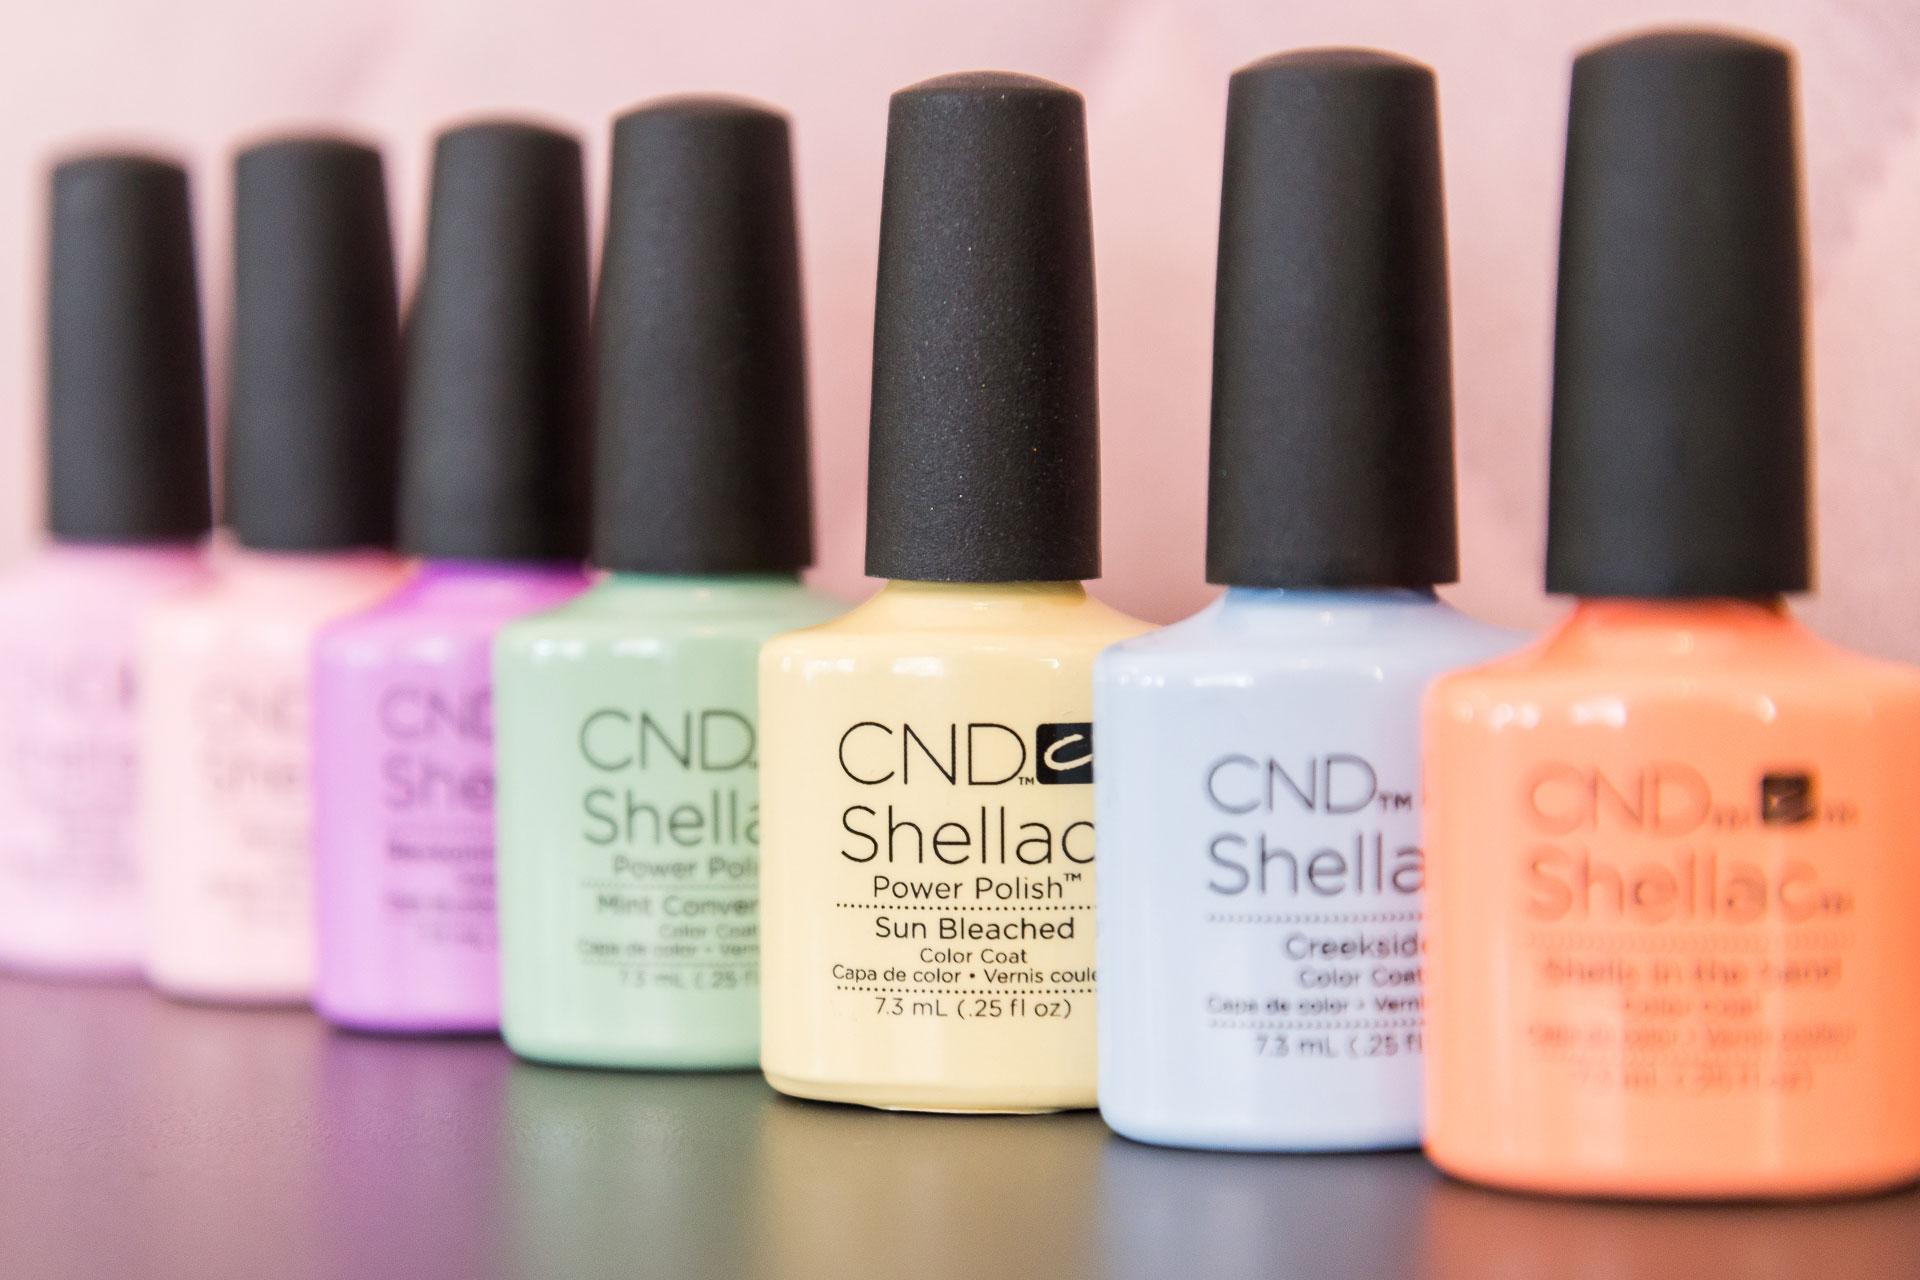 cnd-shellac-nails-edinburgh-1